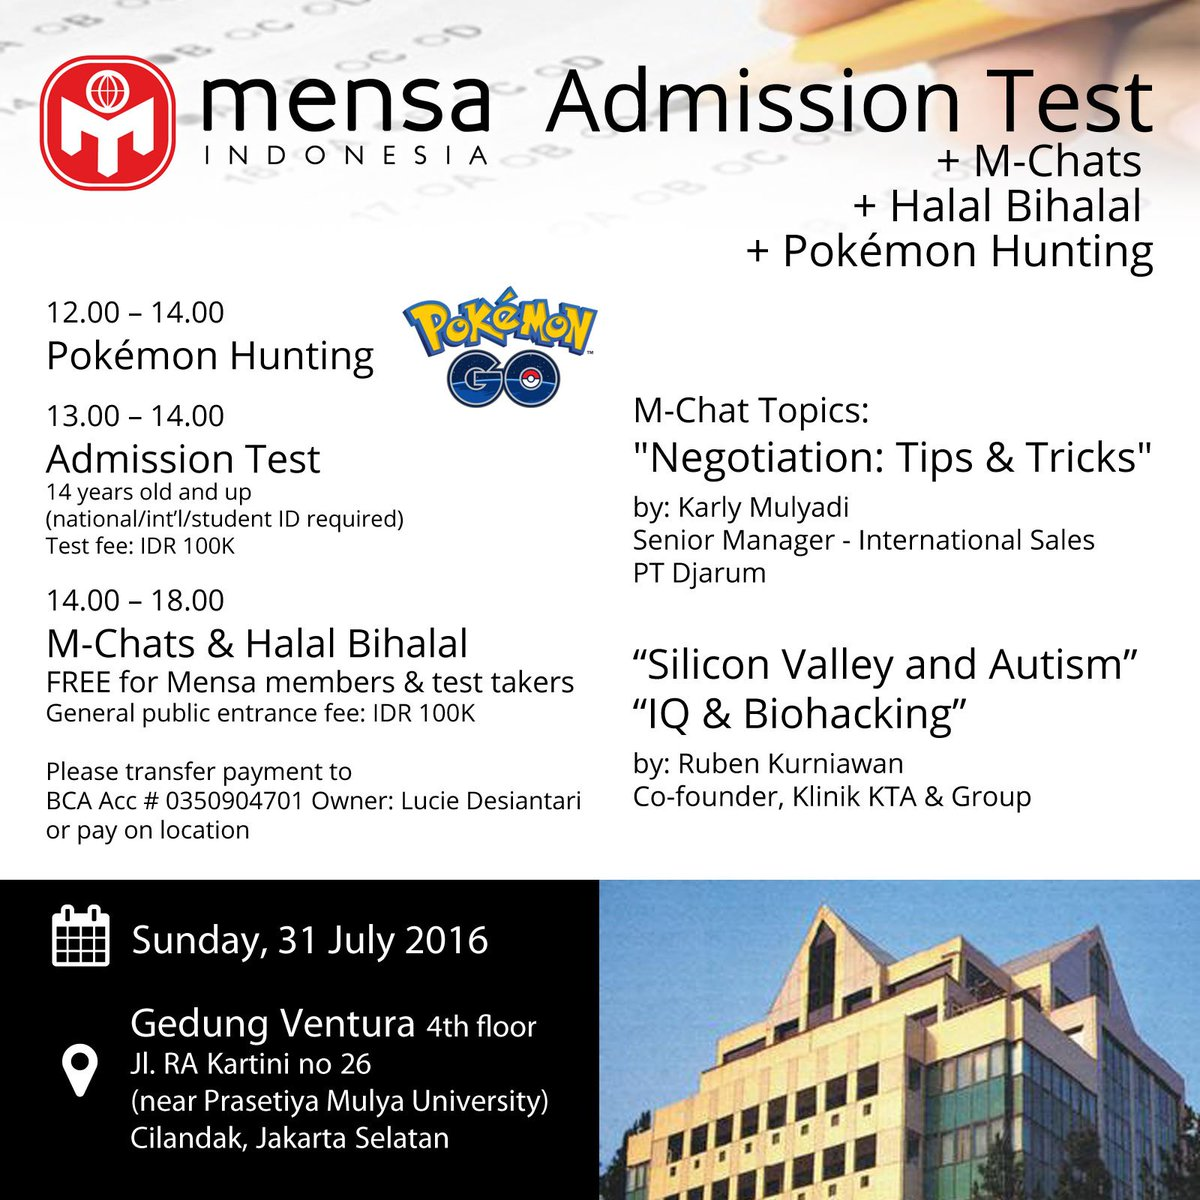 MENSA Indonesia on Twitter: